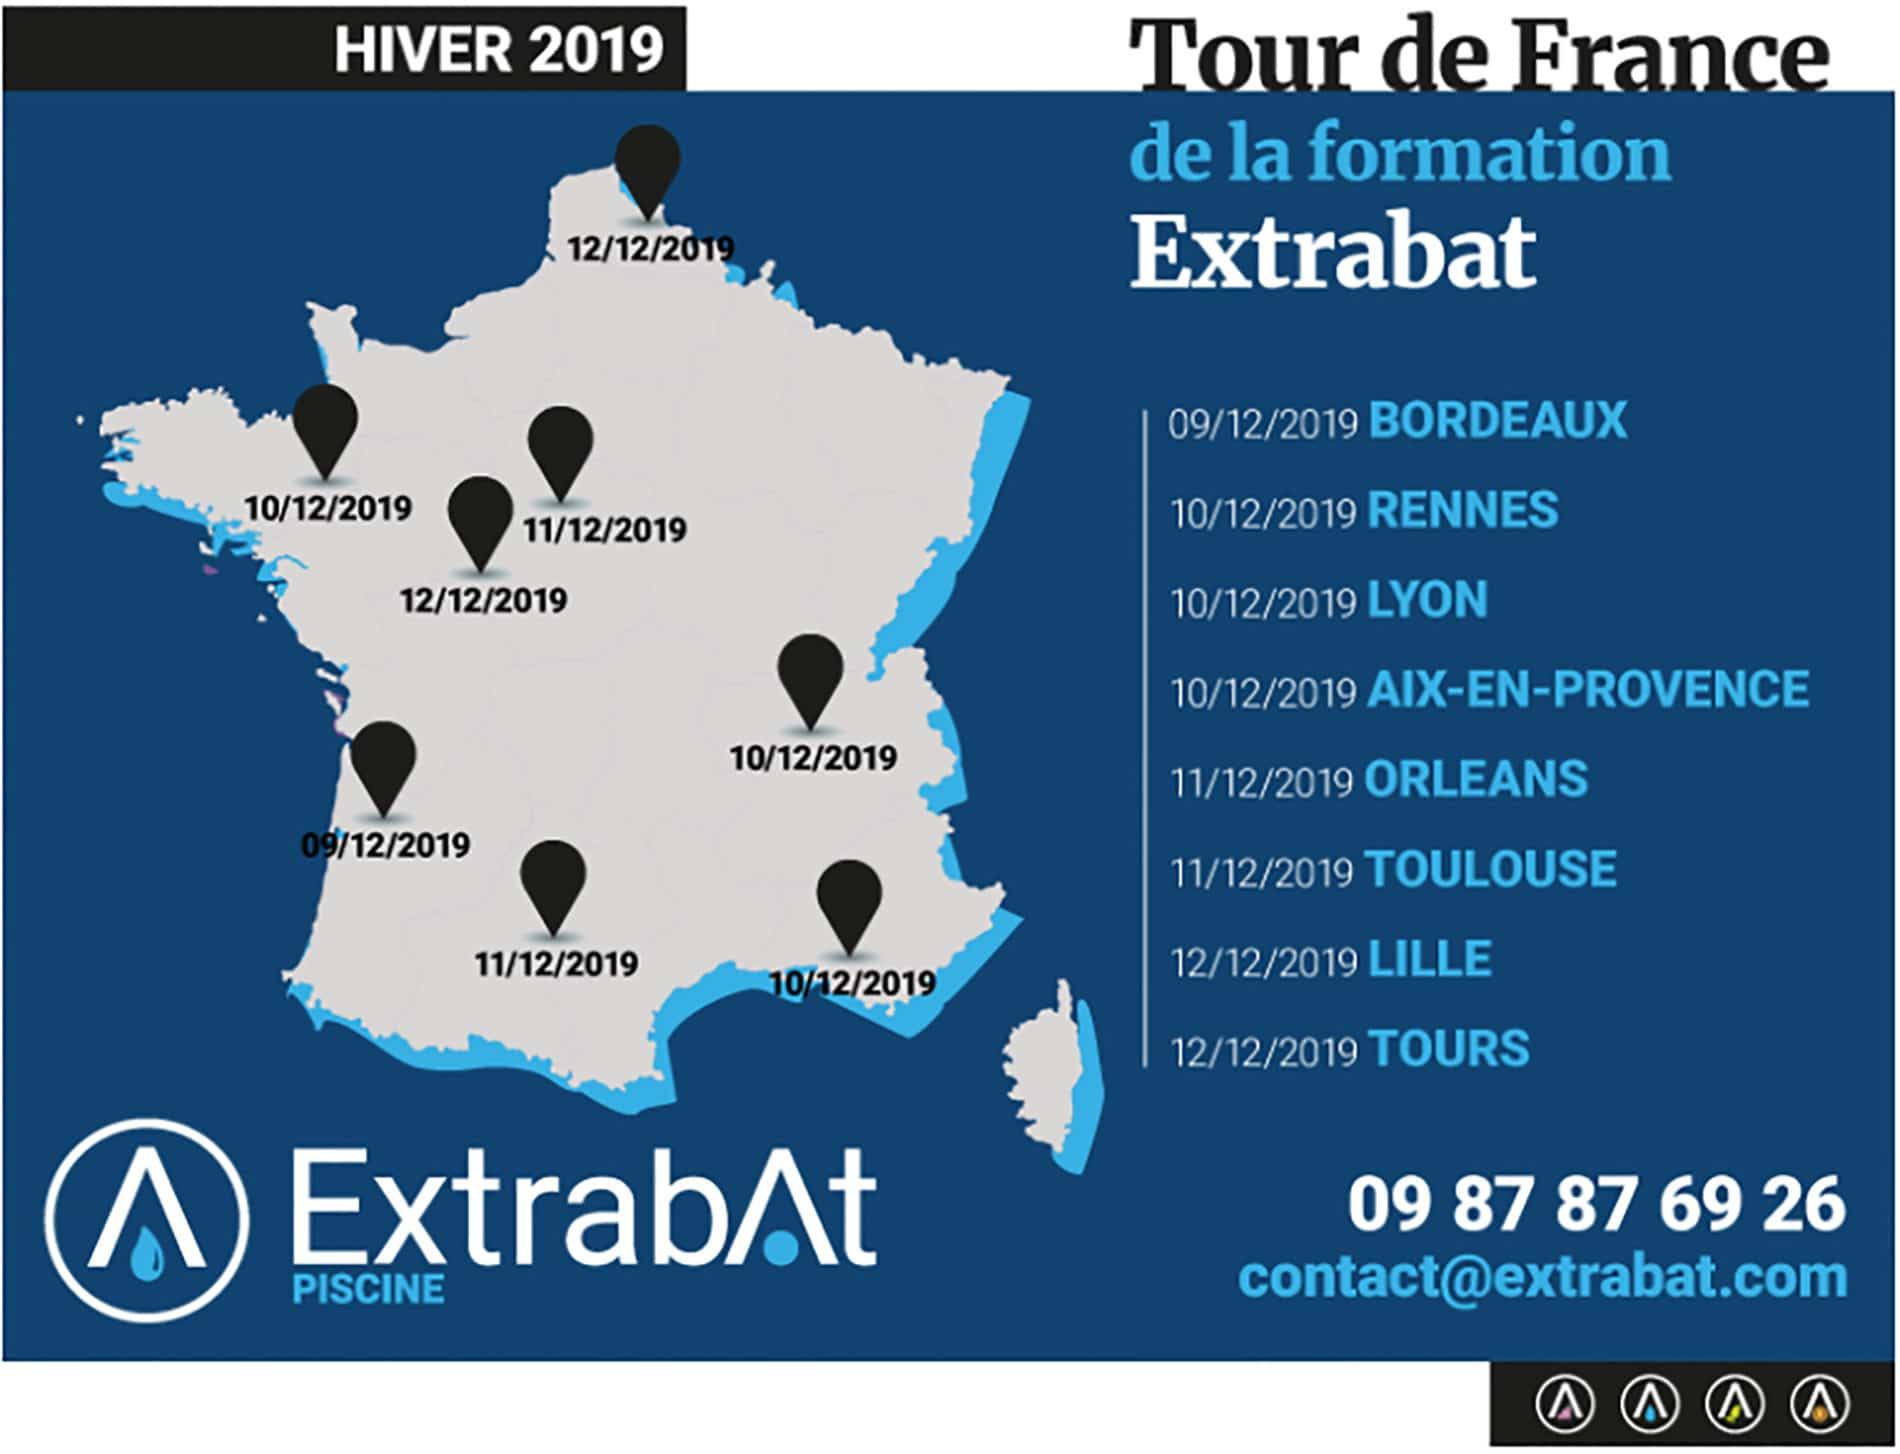 formations Extrabat 2019